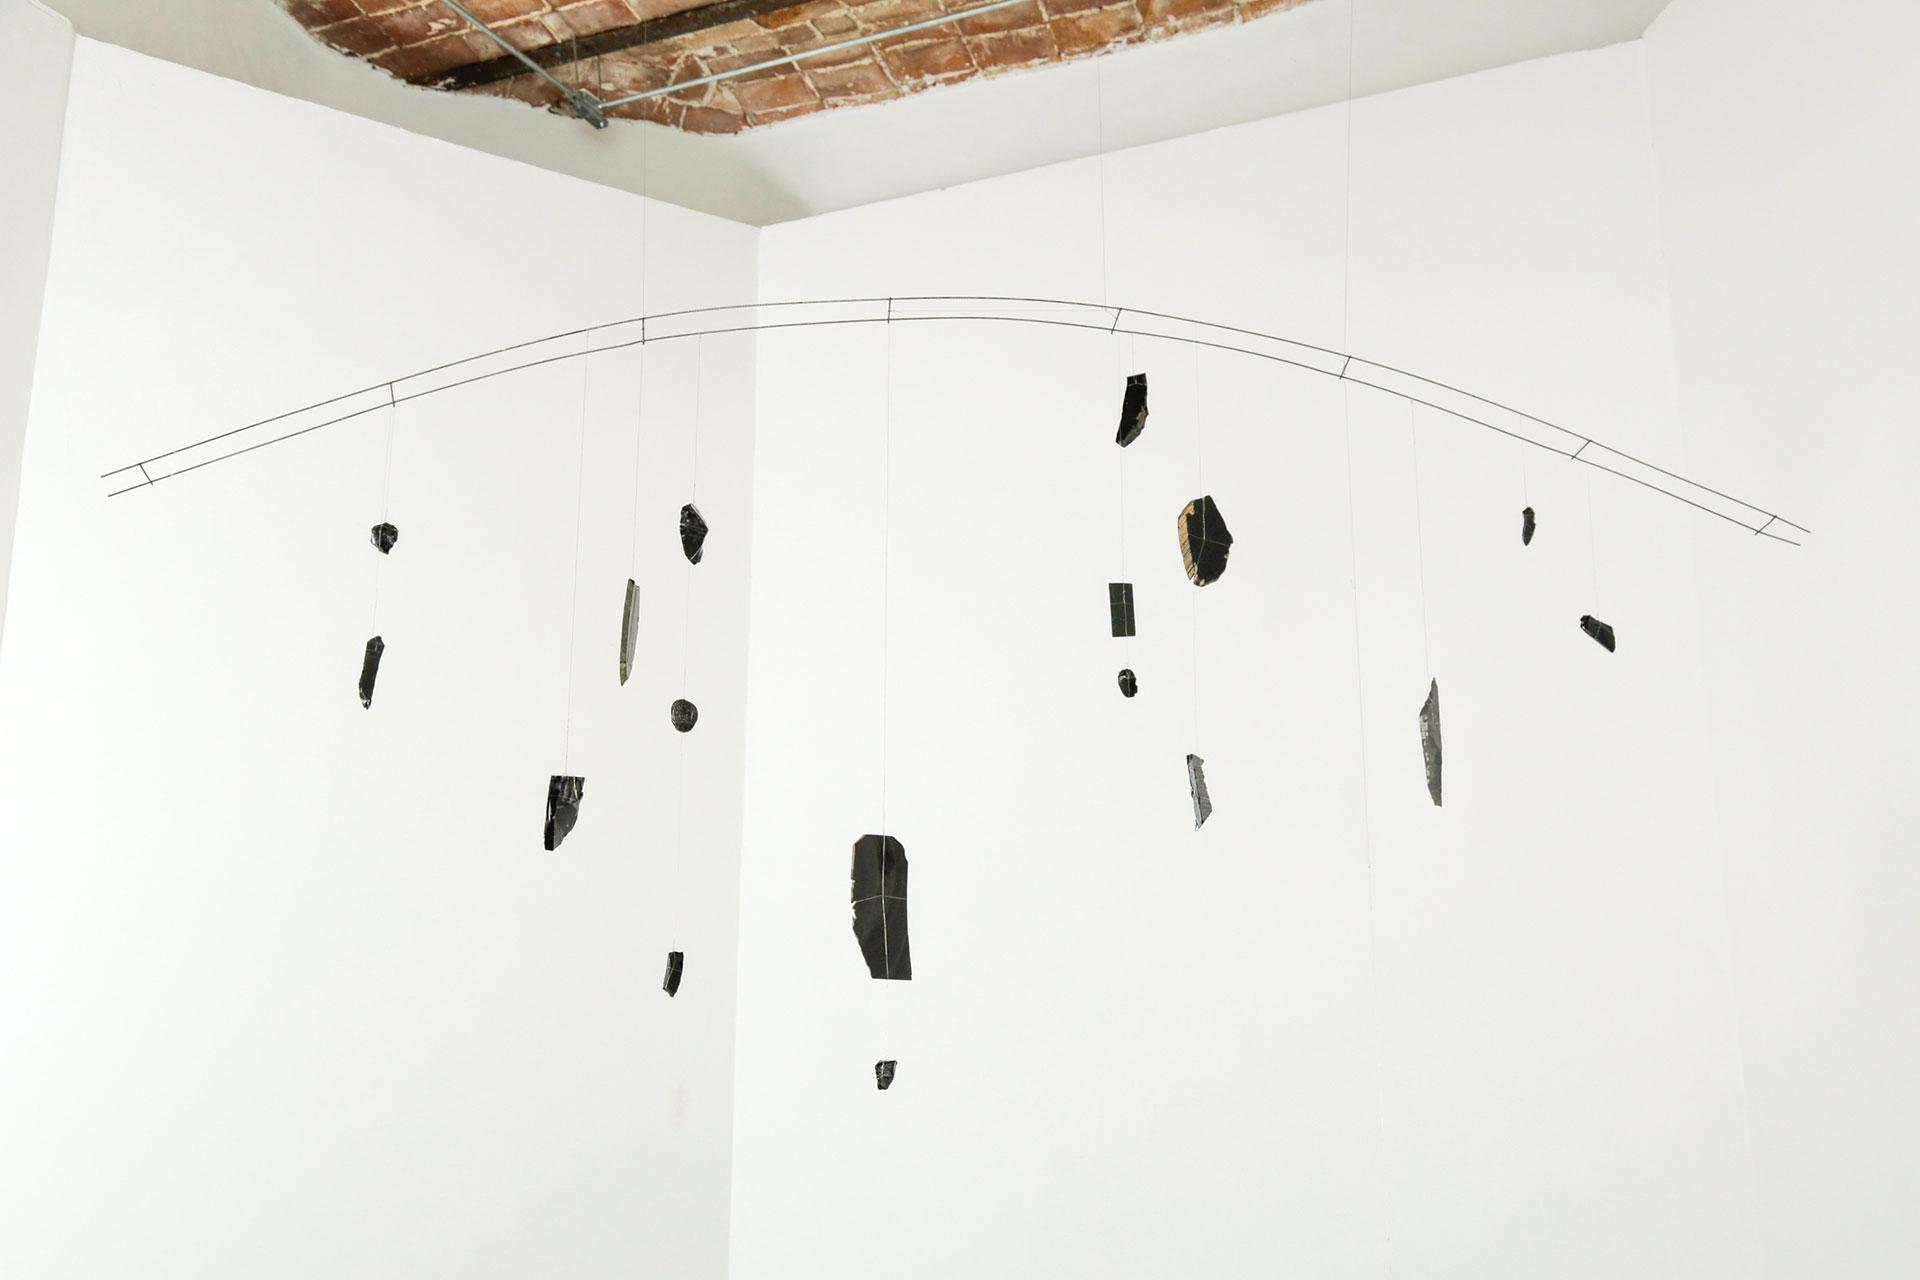 Cielo y tierra #18   Perla Krauze